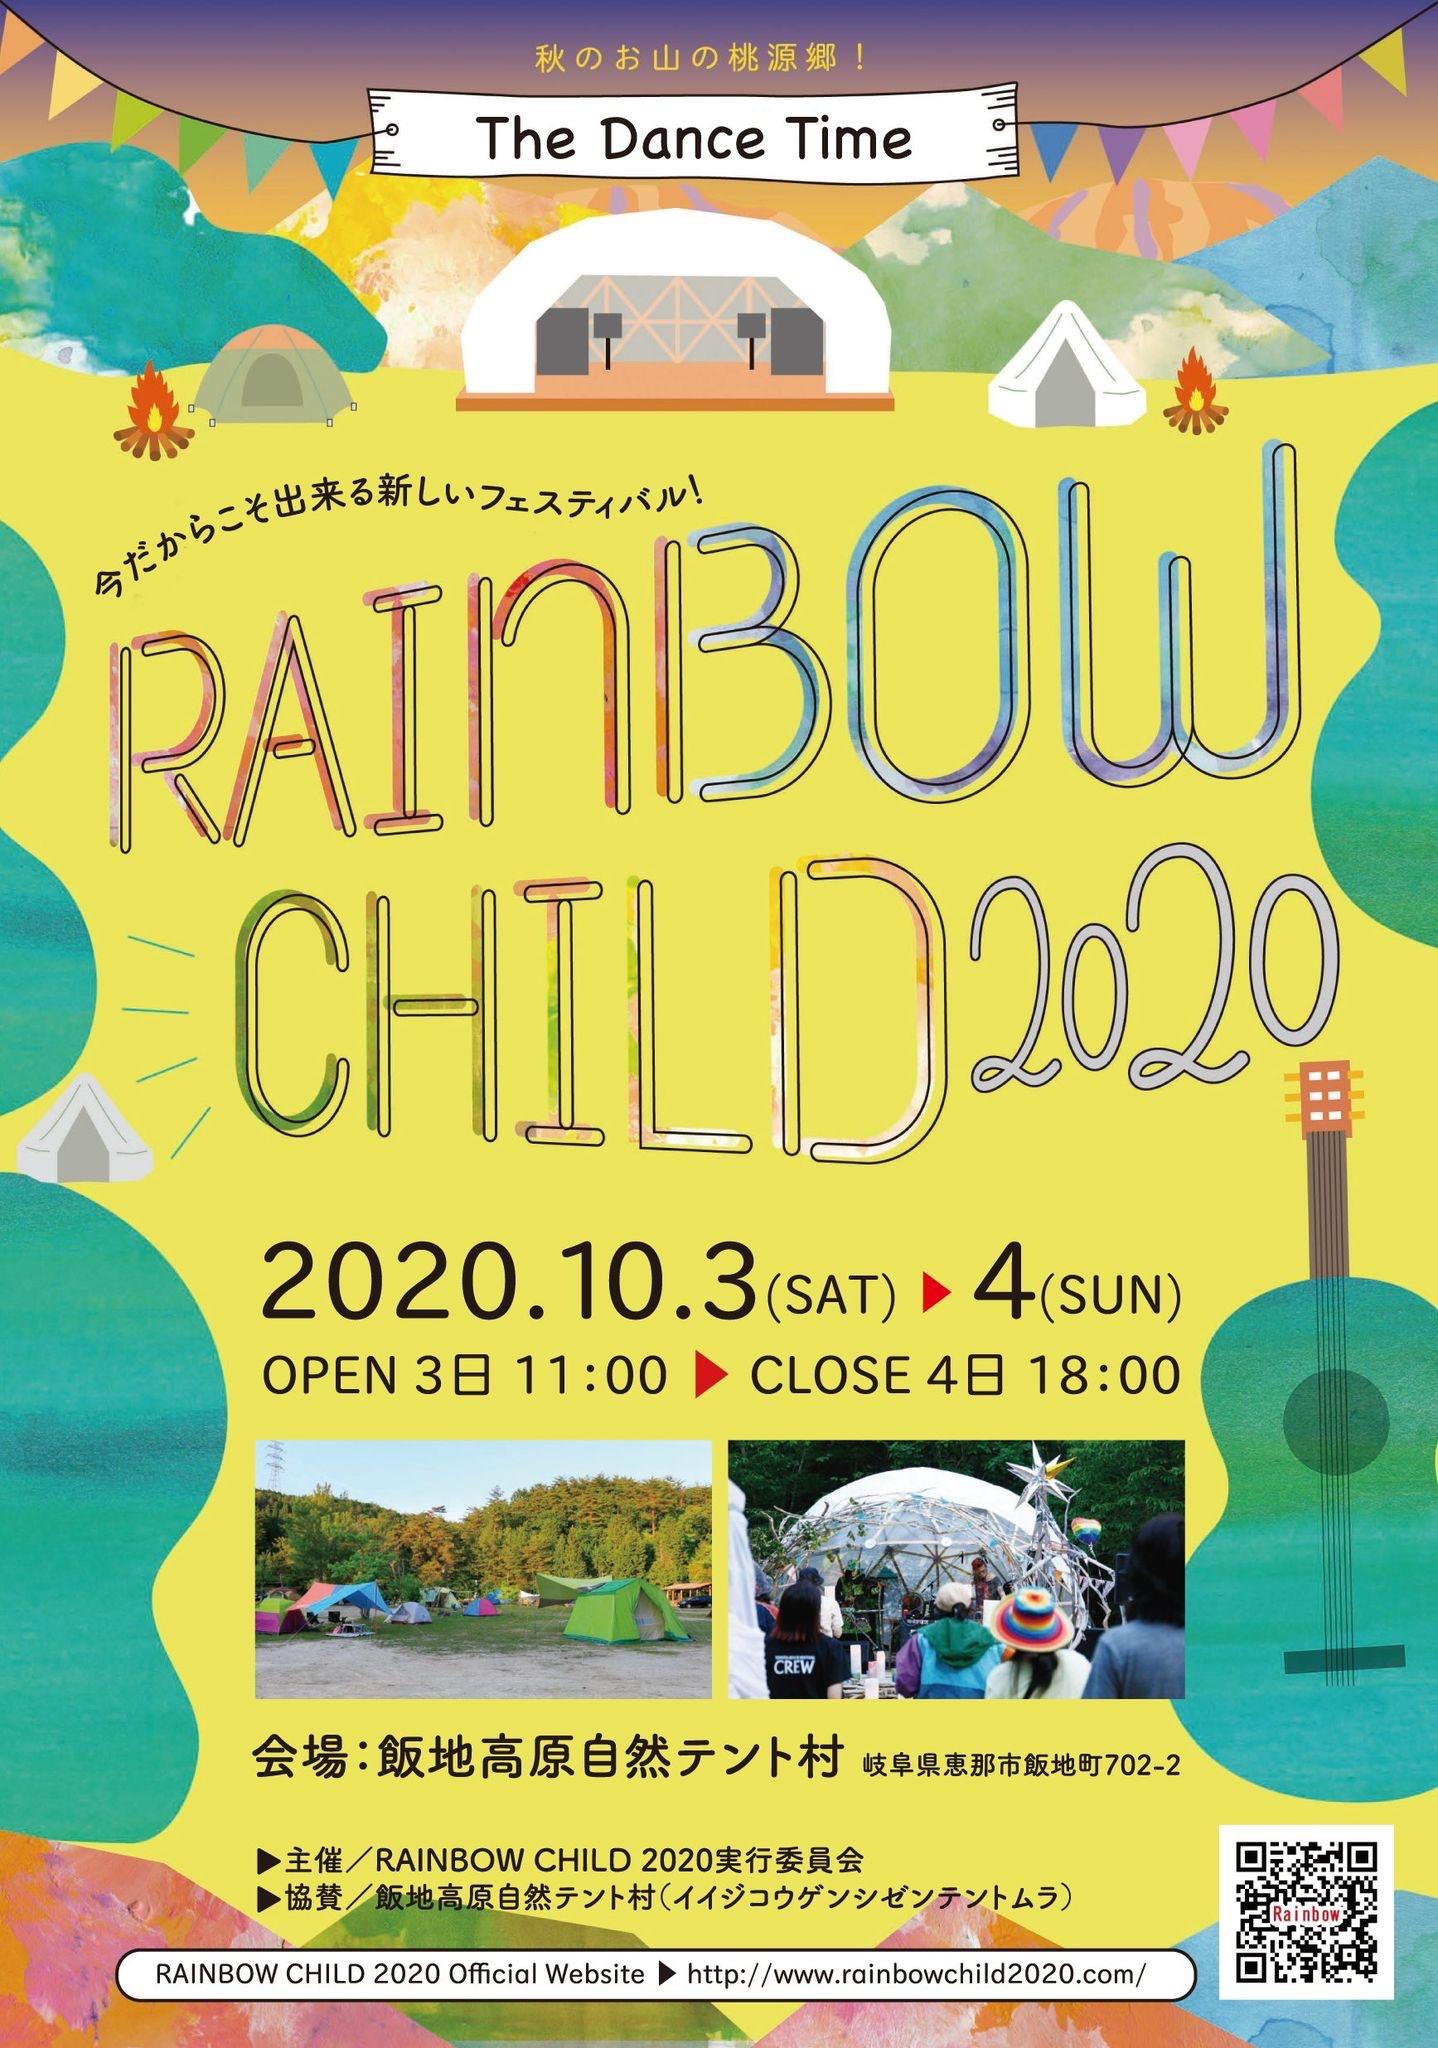 RAINBOW CHILD 2020 ~The Dance Time~